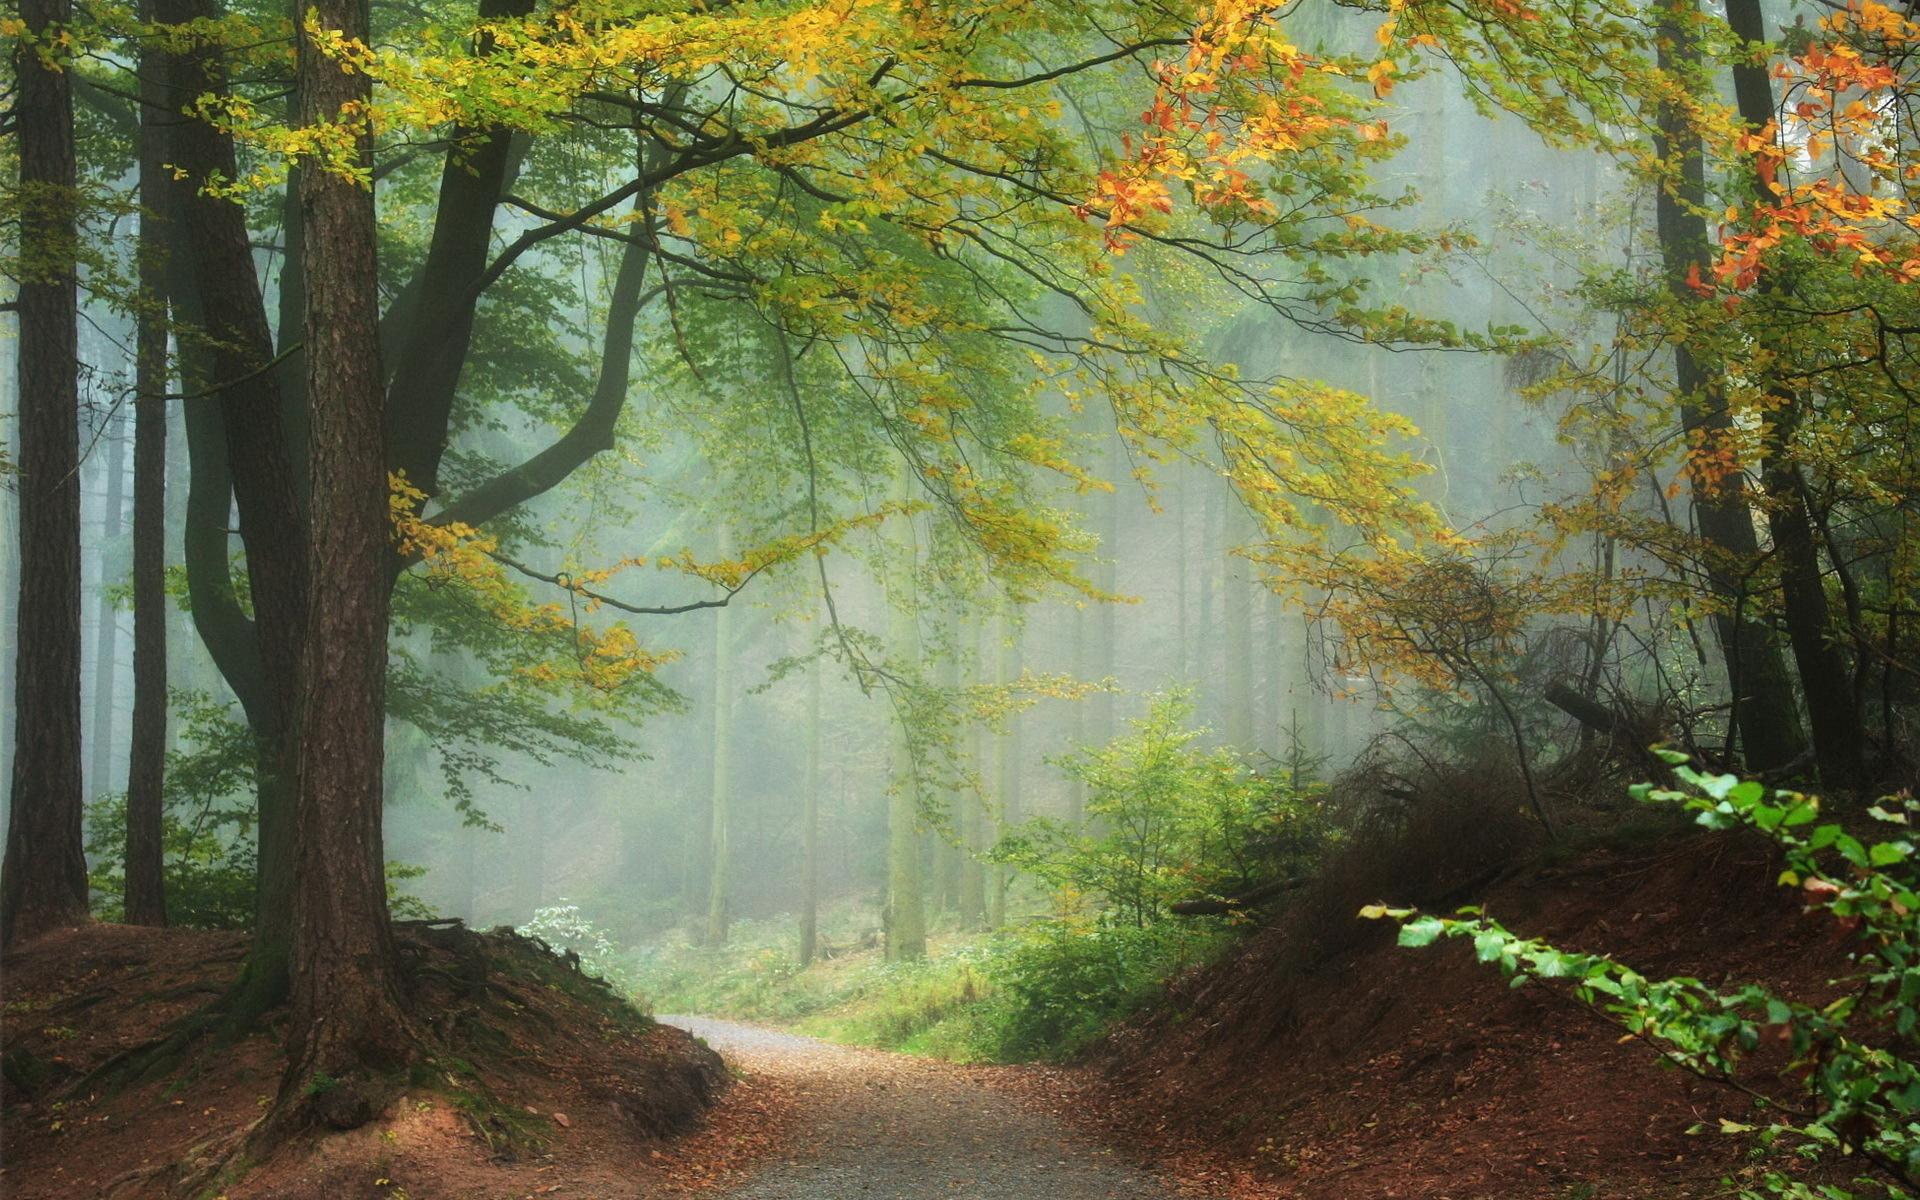 nature landscapes trees forest leaves autumn fall seasons path trail haze fog mist color. Black Bedroom Furniture Sets. Home Design Ideas